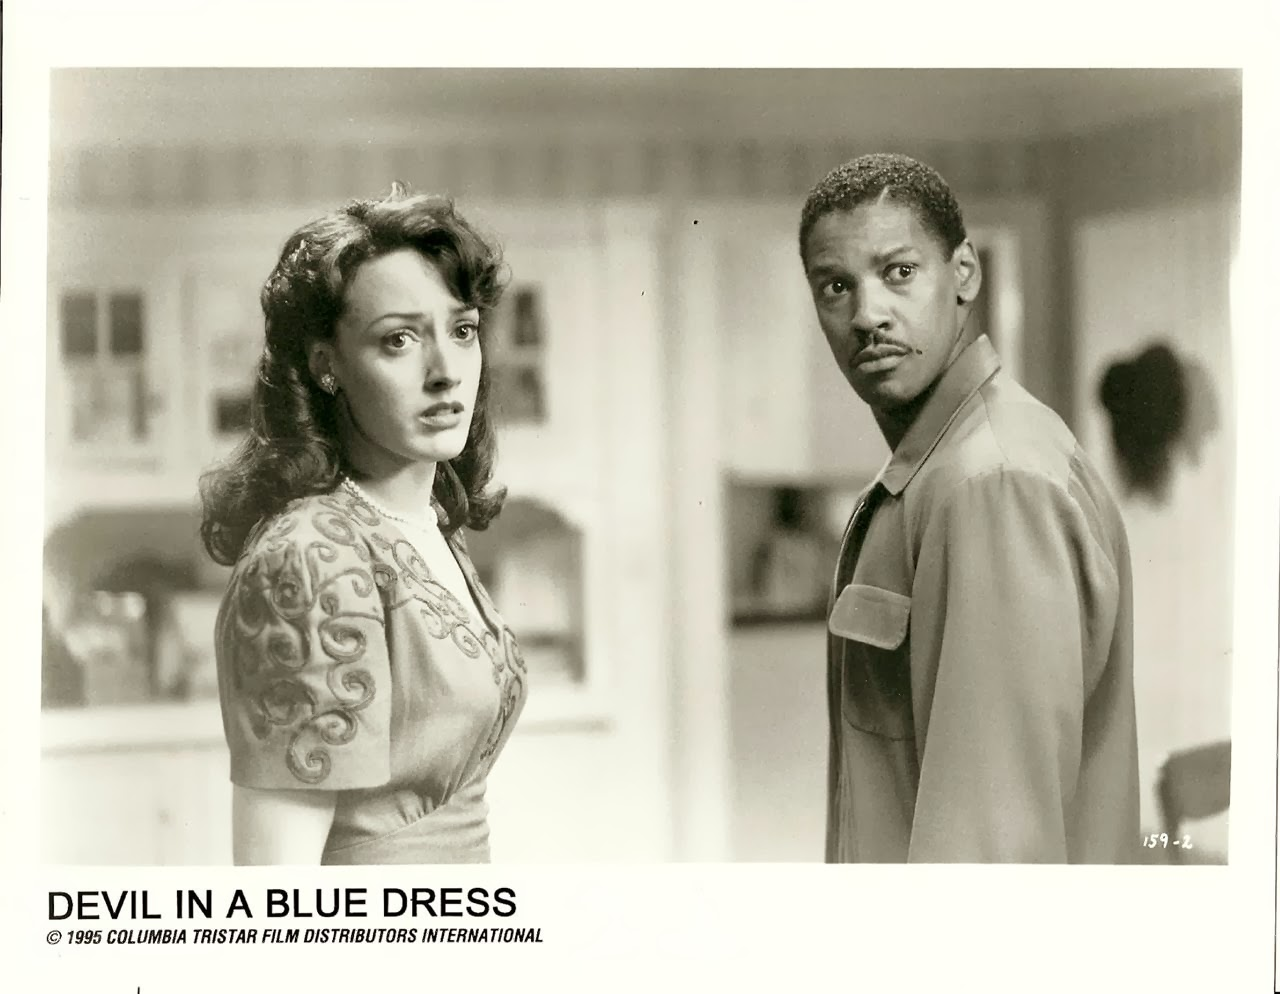 The movie devil in a blue dress